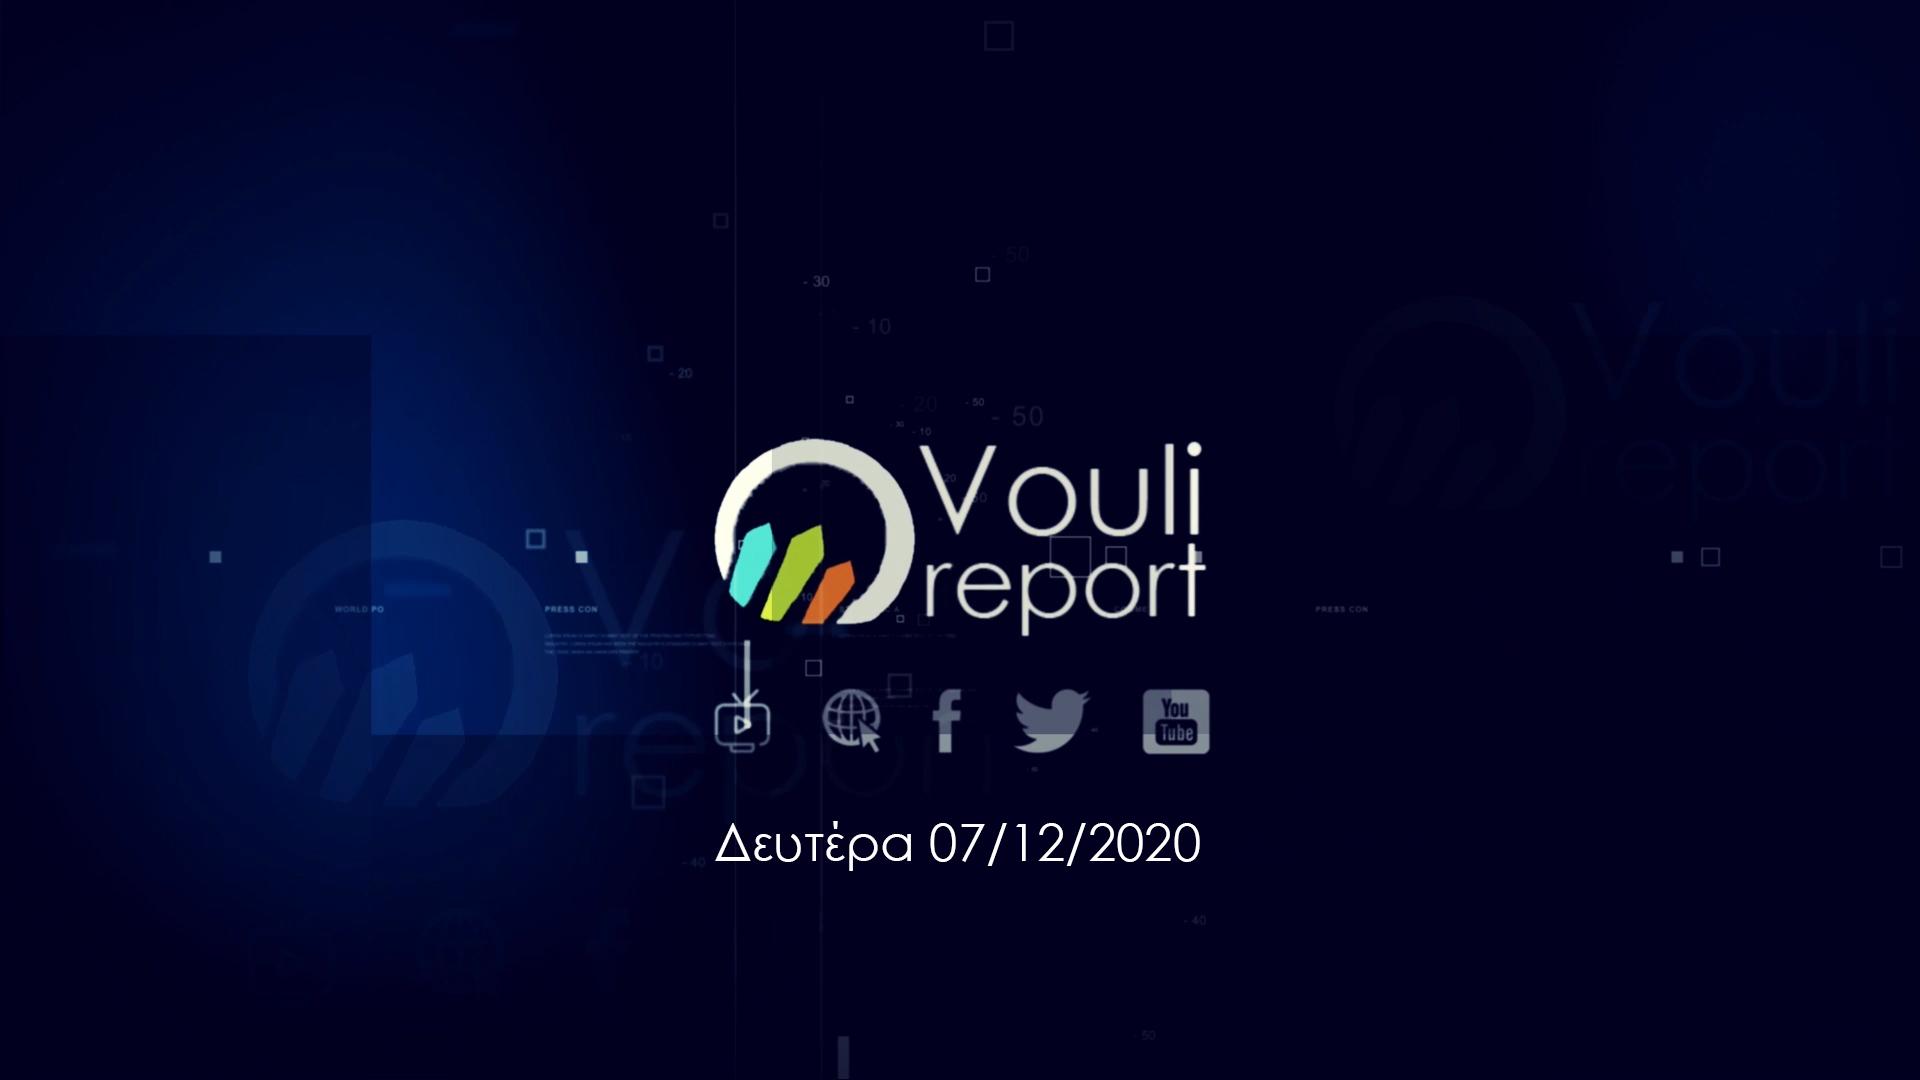 Vouli report   7/12/2020